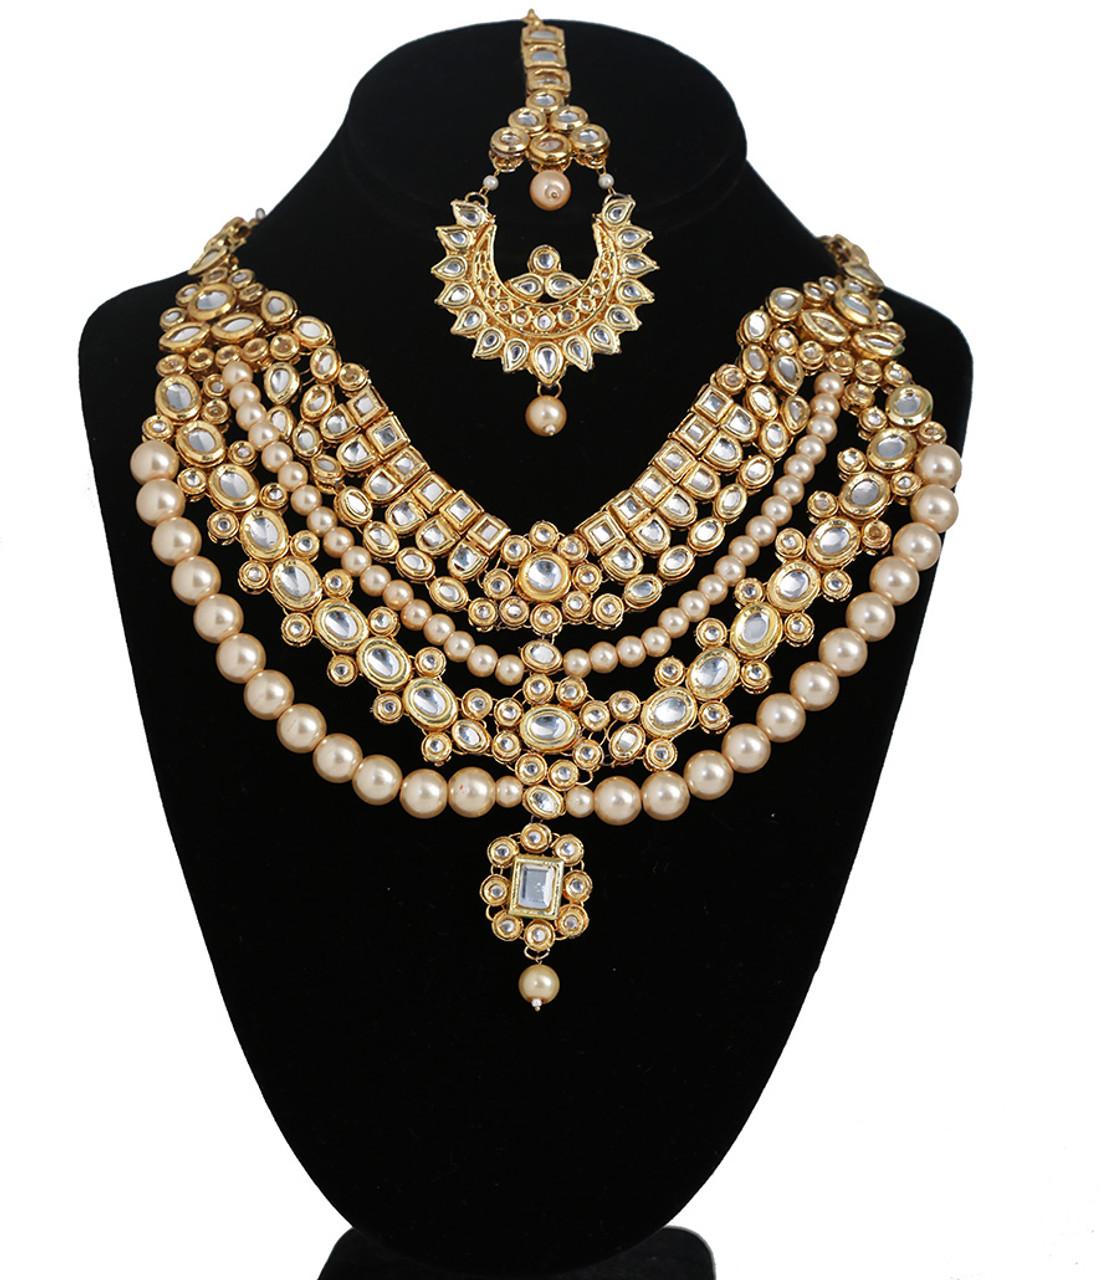 Royal Meena Kundan Pearls Designer Jewelry Necklace With